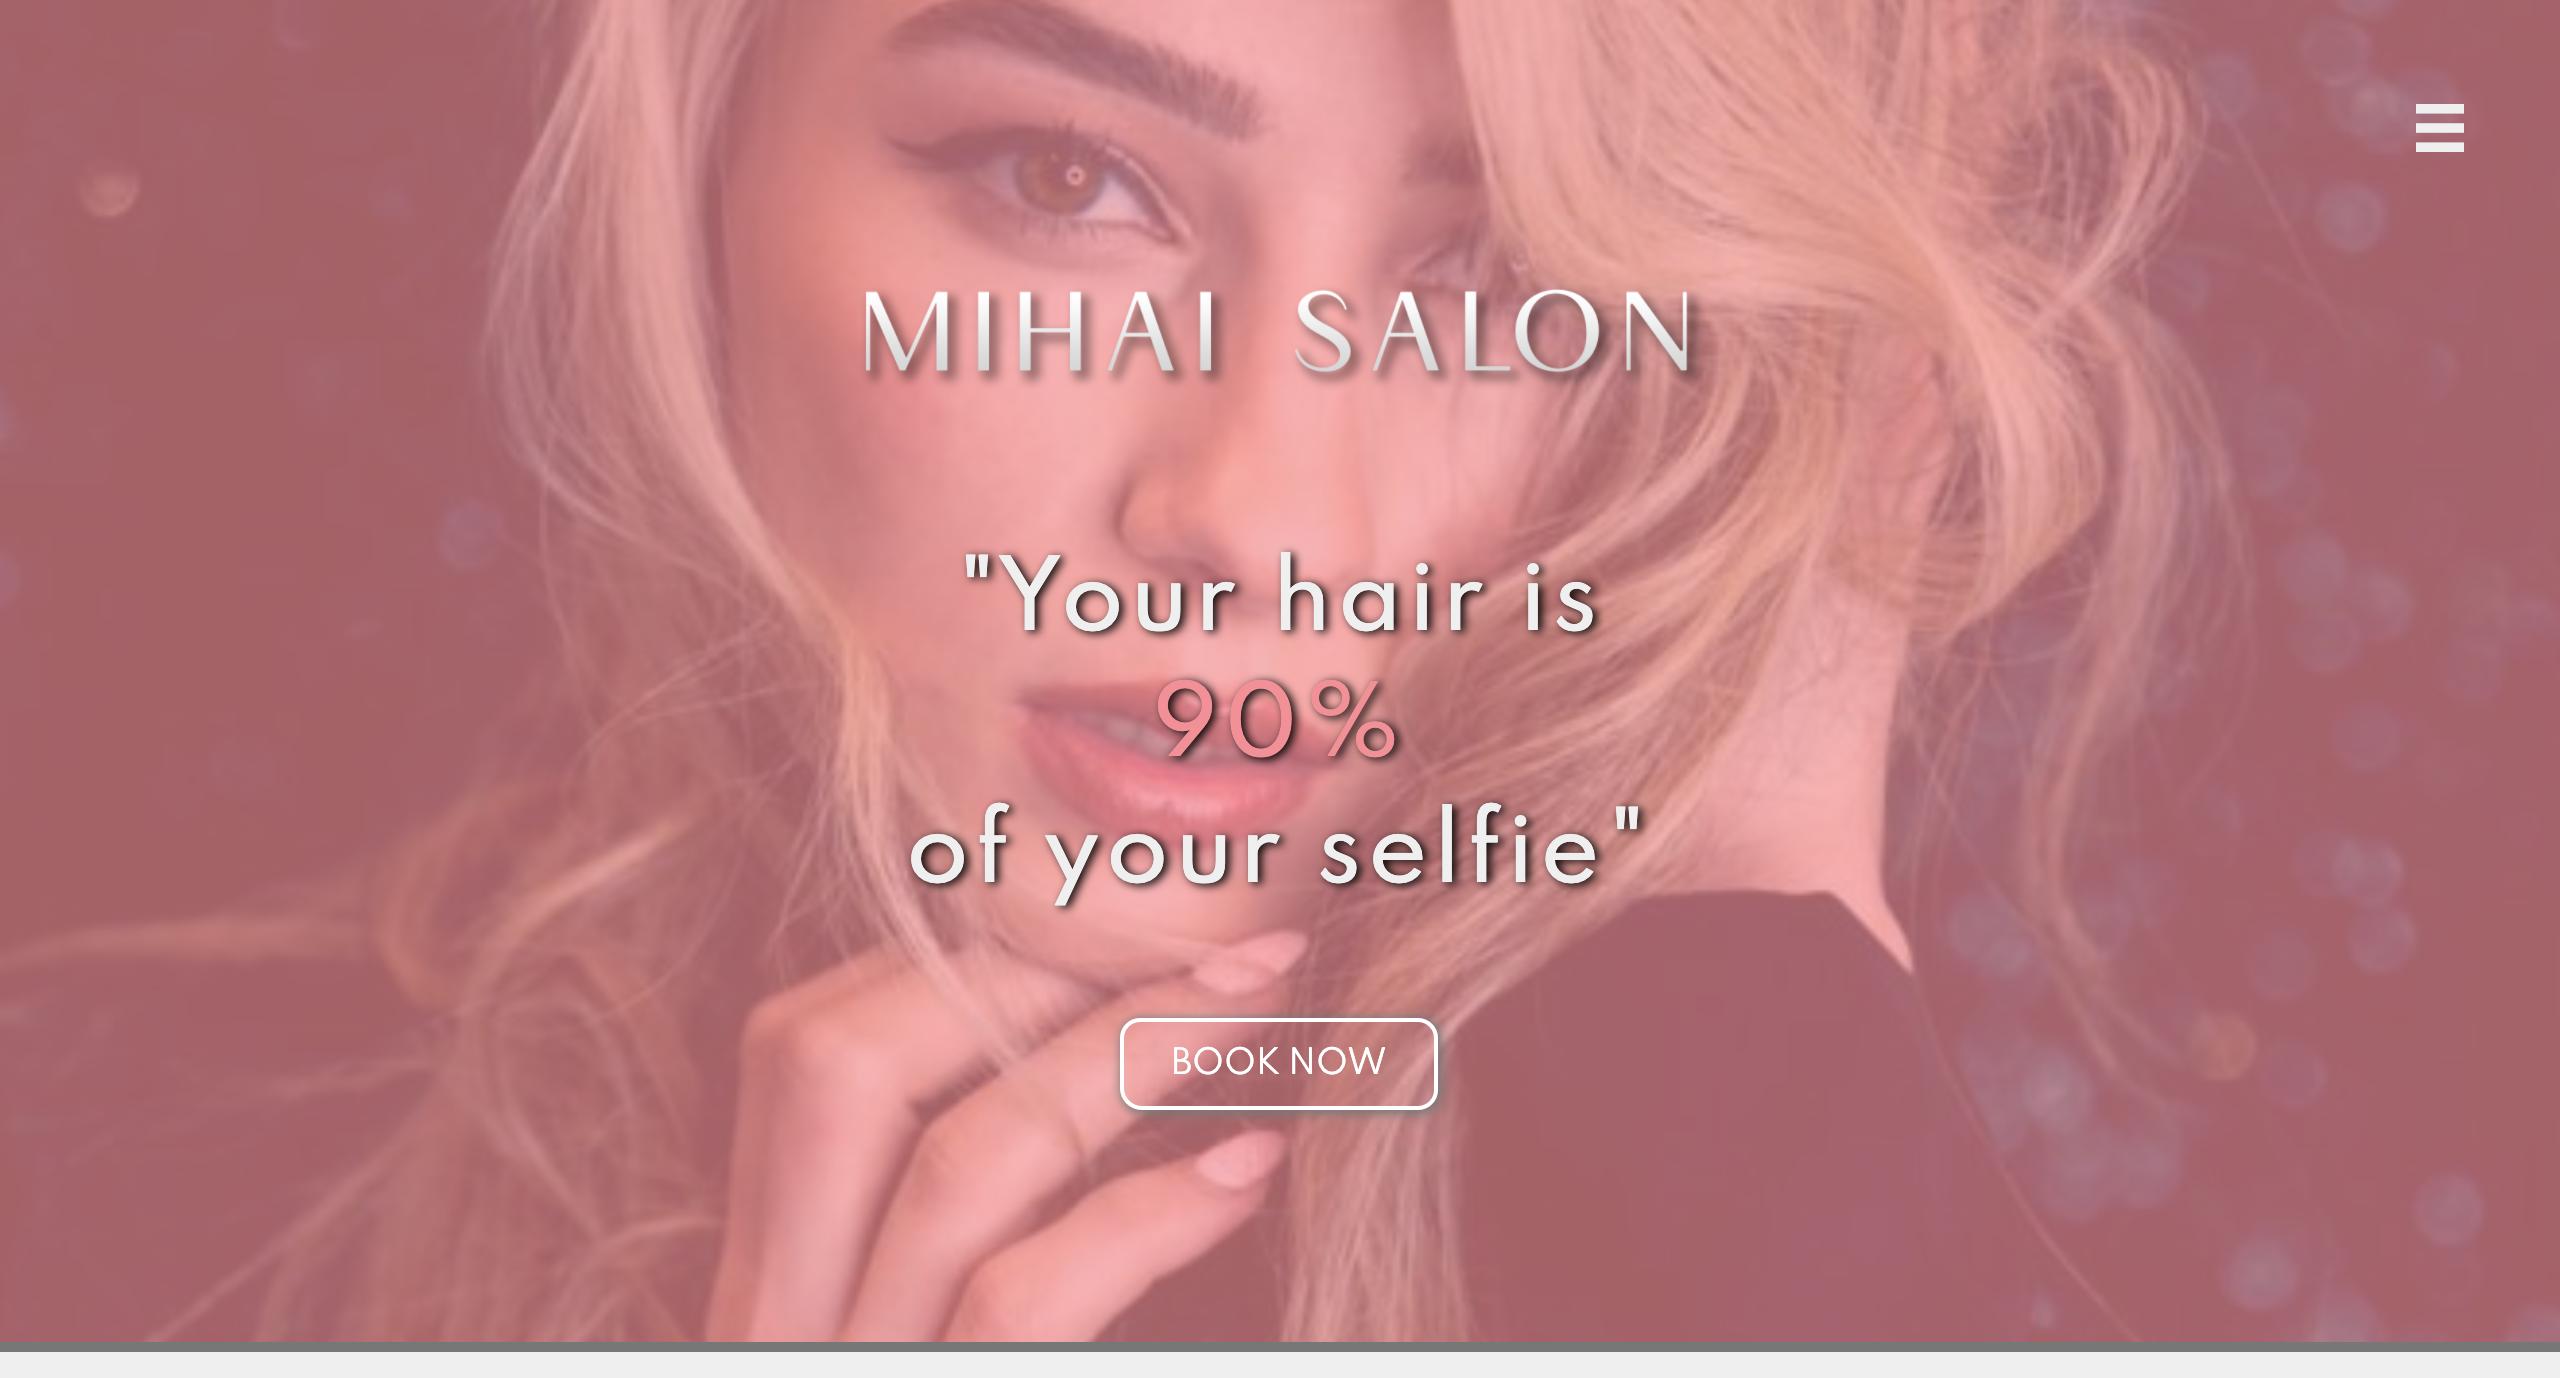 Mihai Salon Website screenshot